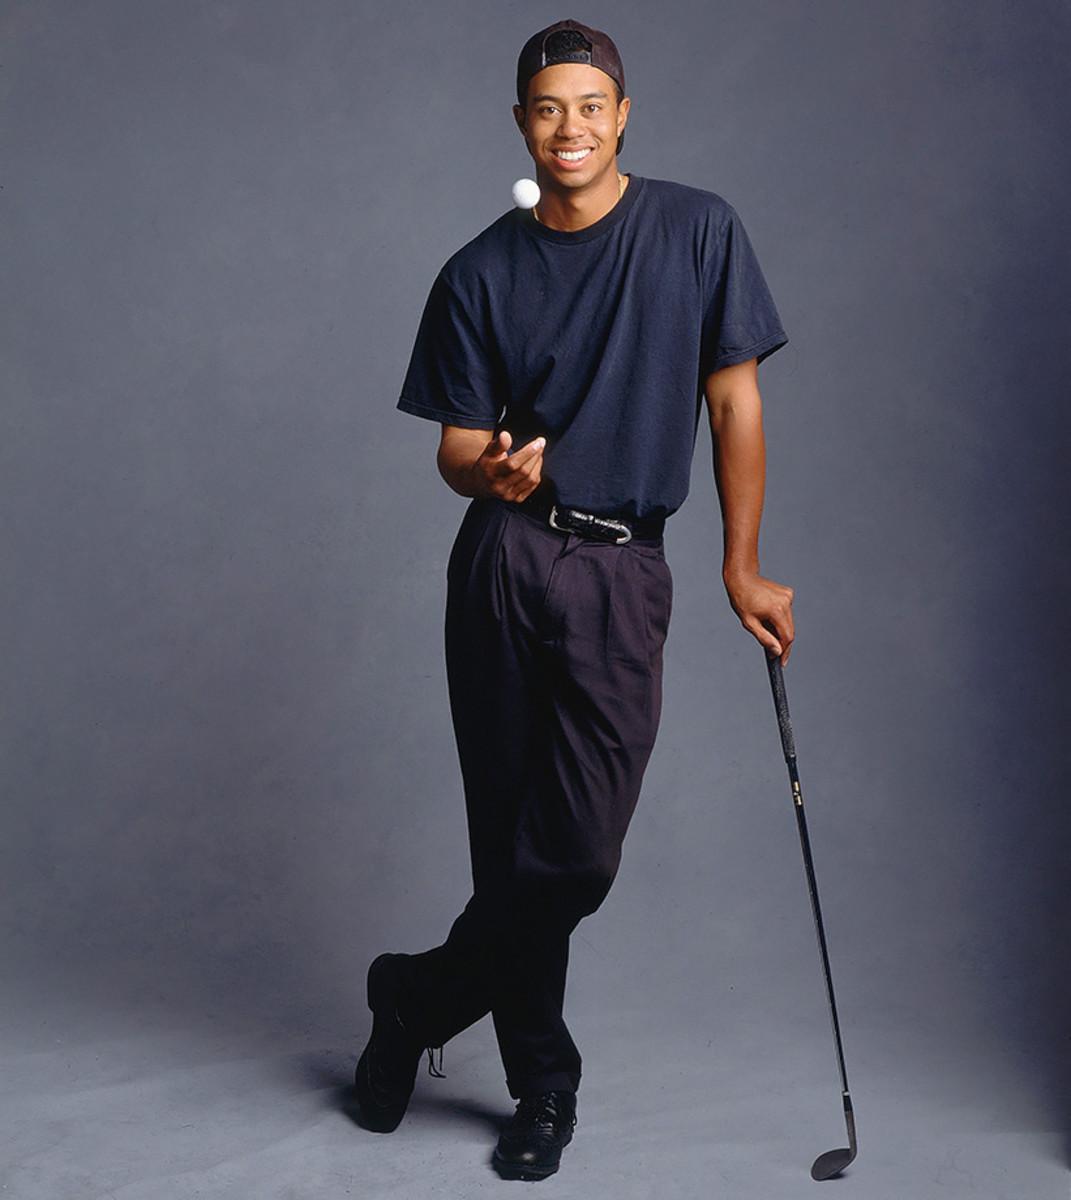 1996-1204-Tiger-Woods-005533122.jpg